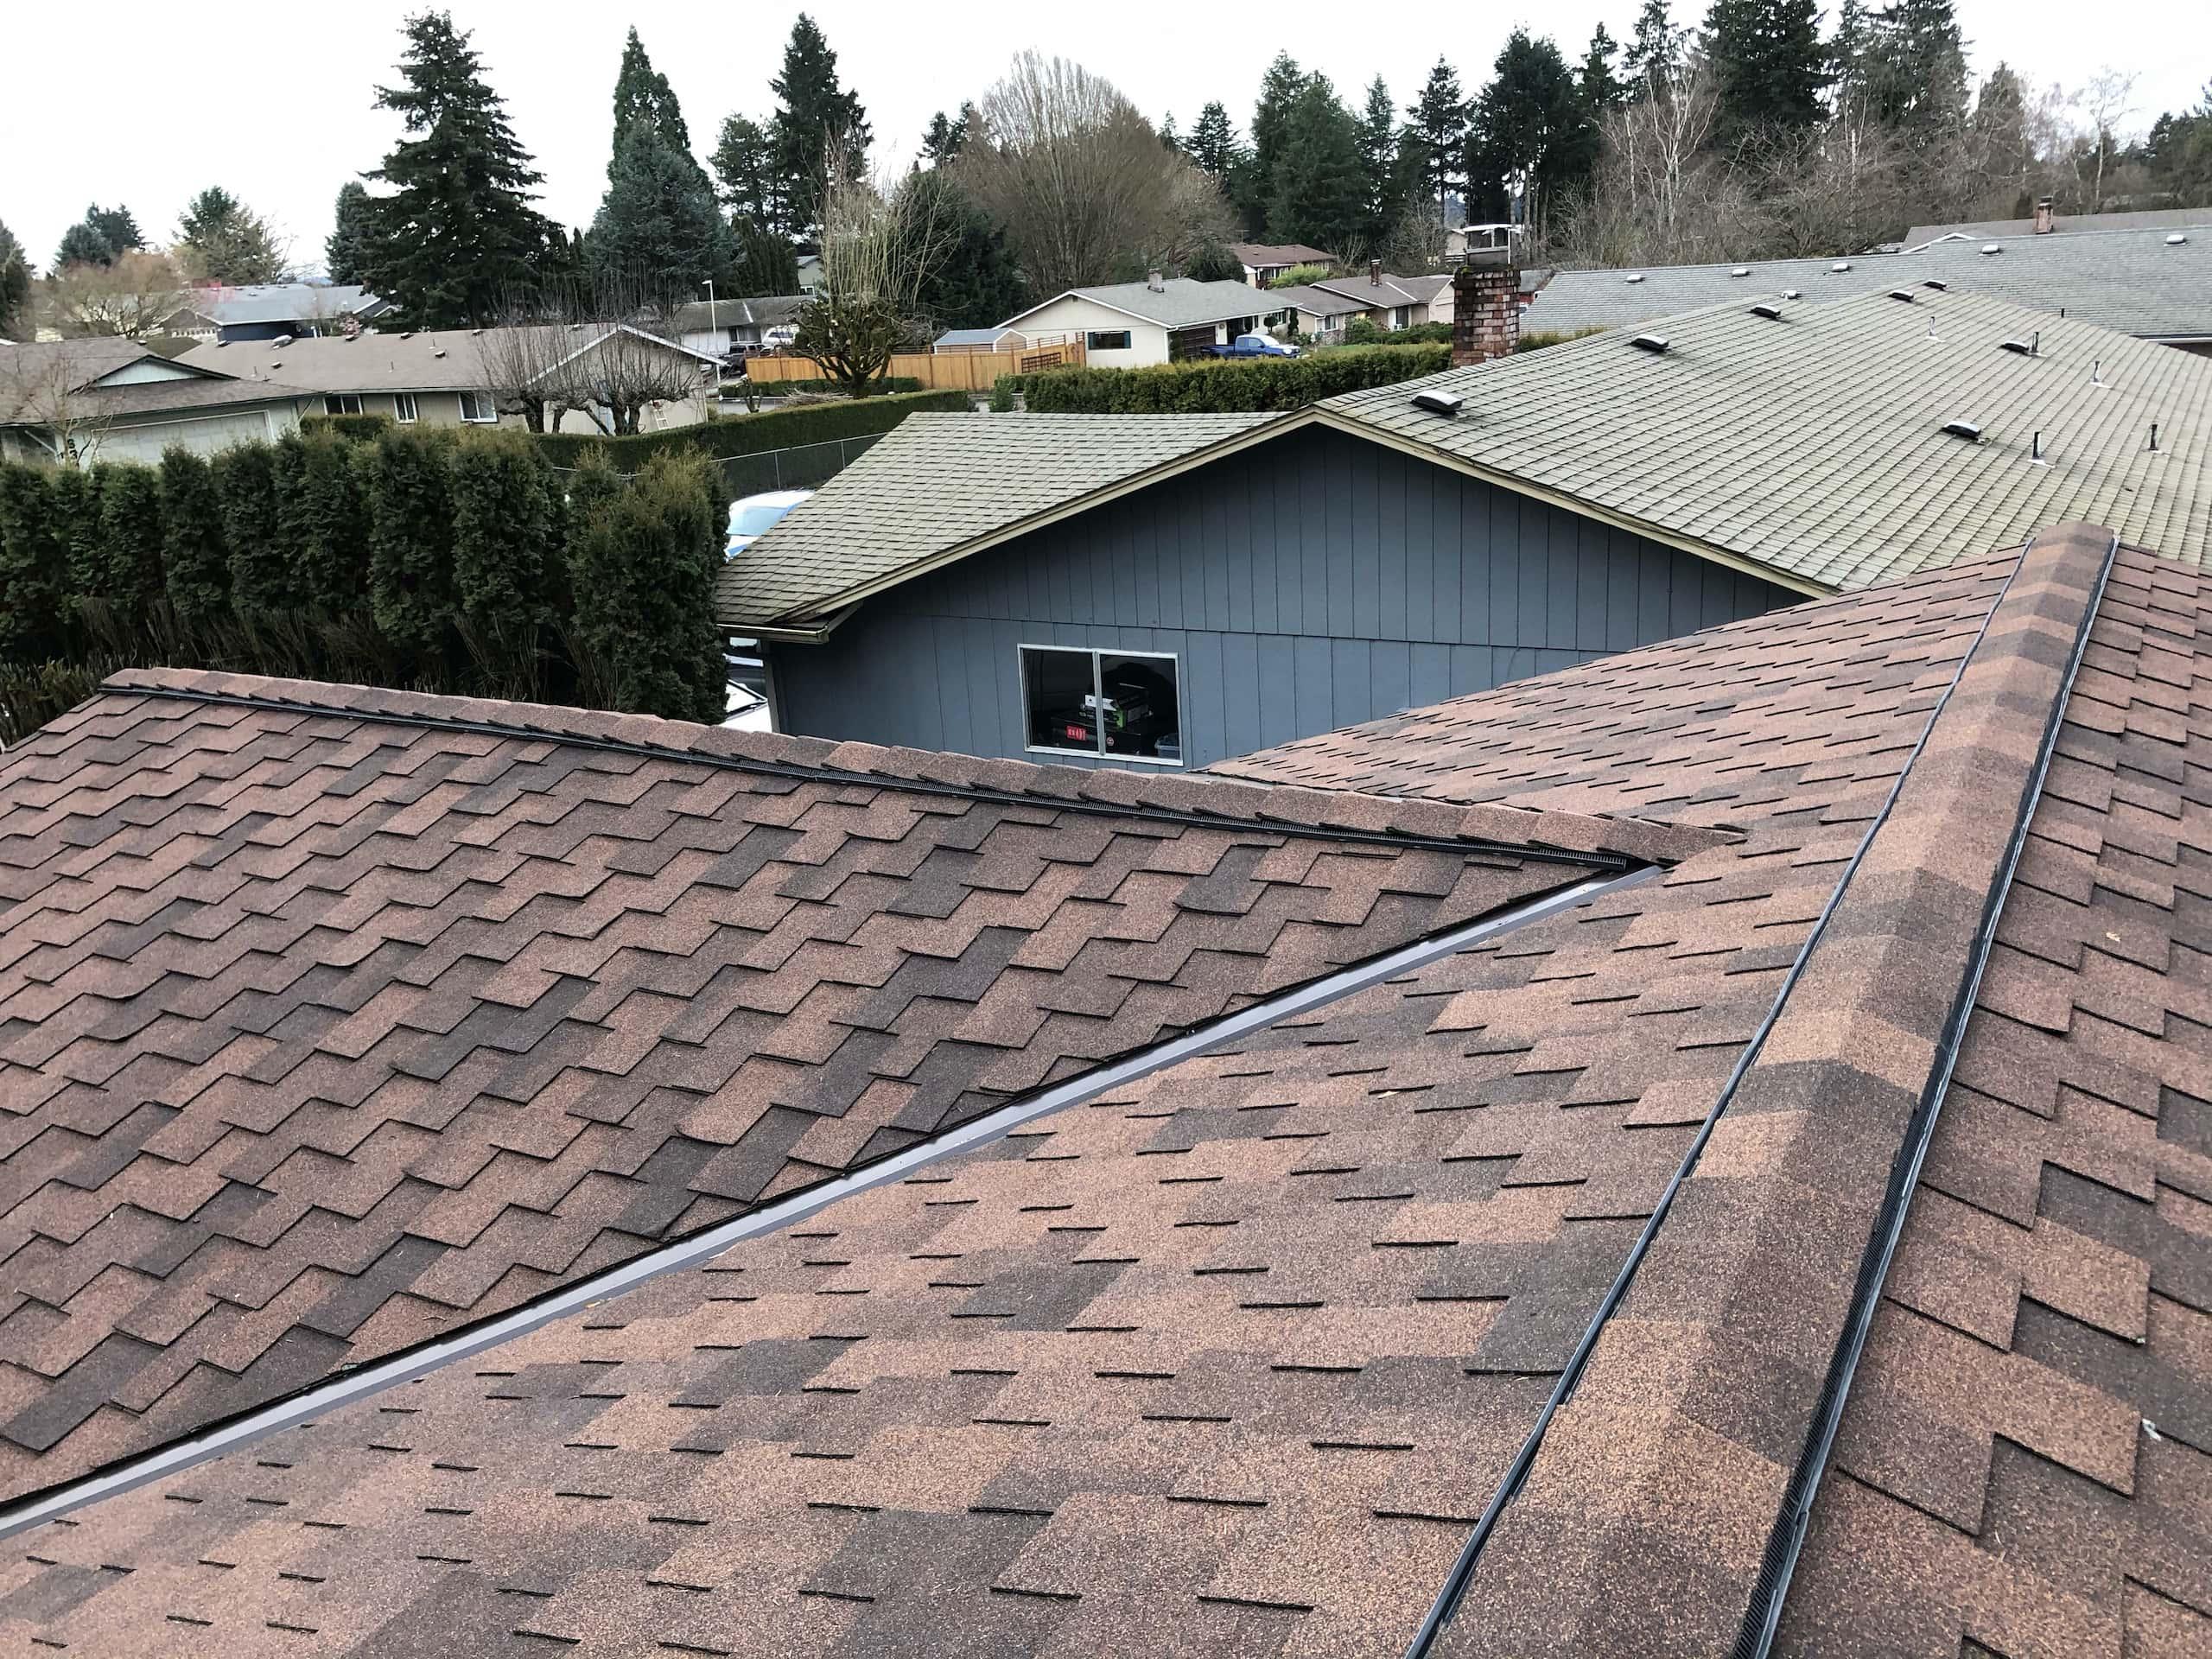 Reliance Roof Pros LLC   Beaverton   New Roof   Malarkey Windsor SG   Antique Brown   Valley Ridge